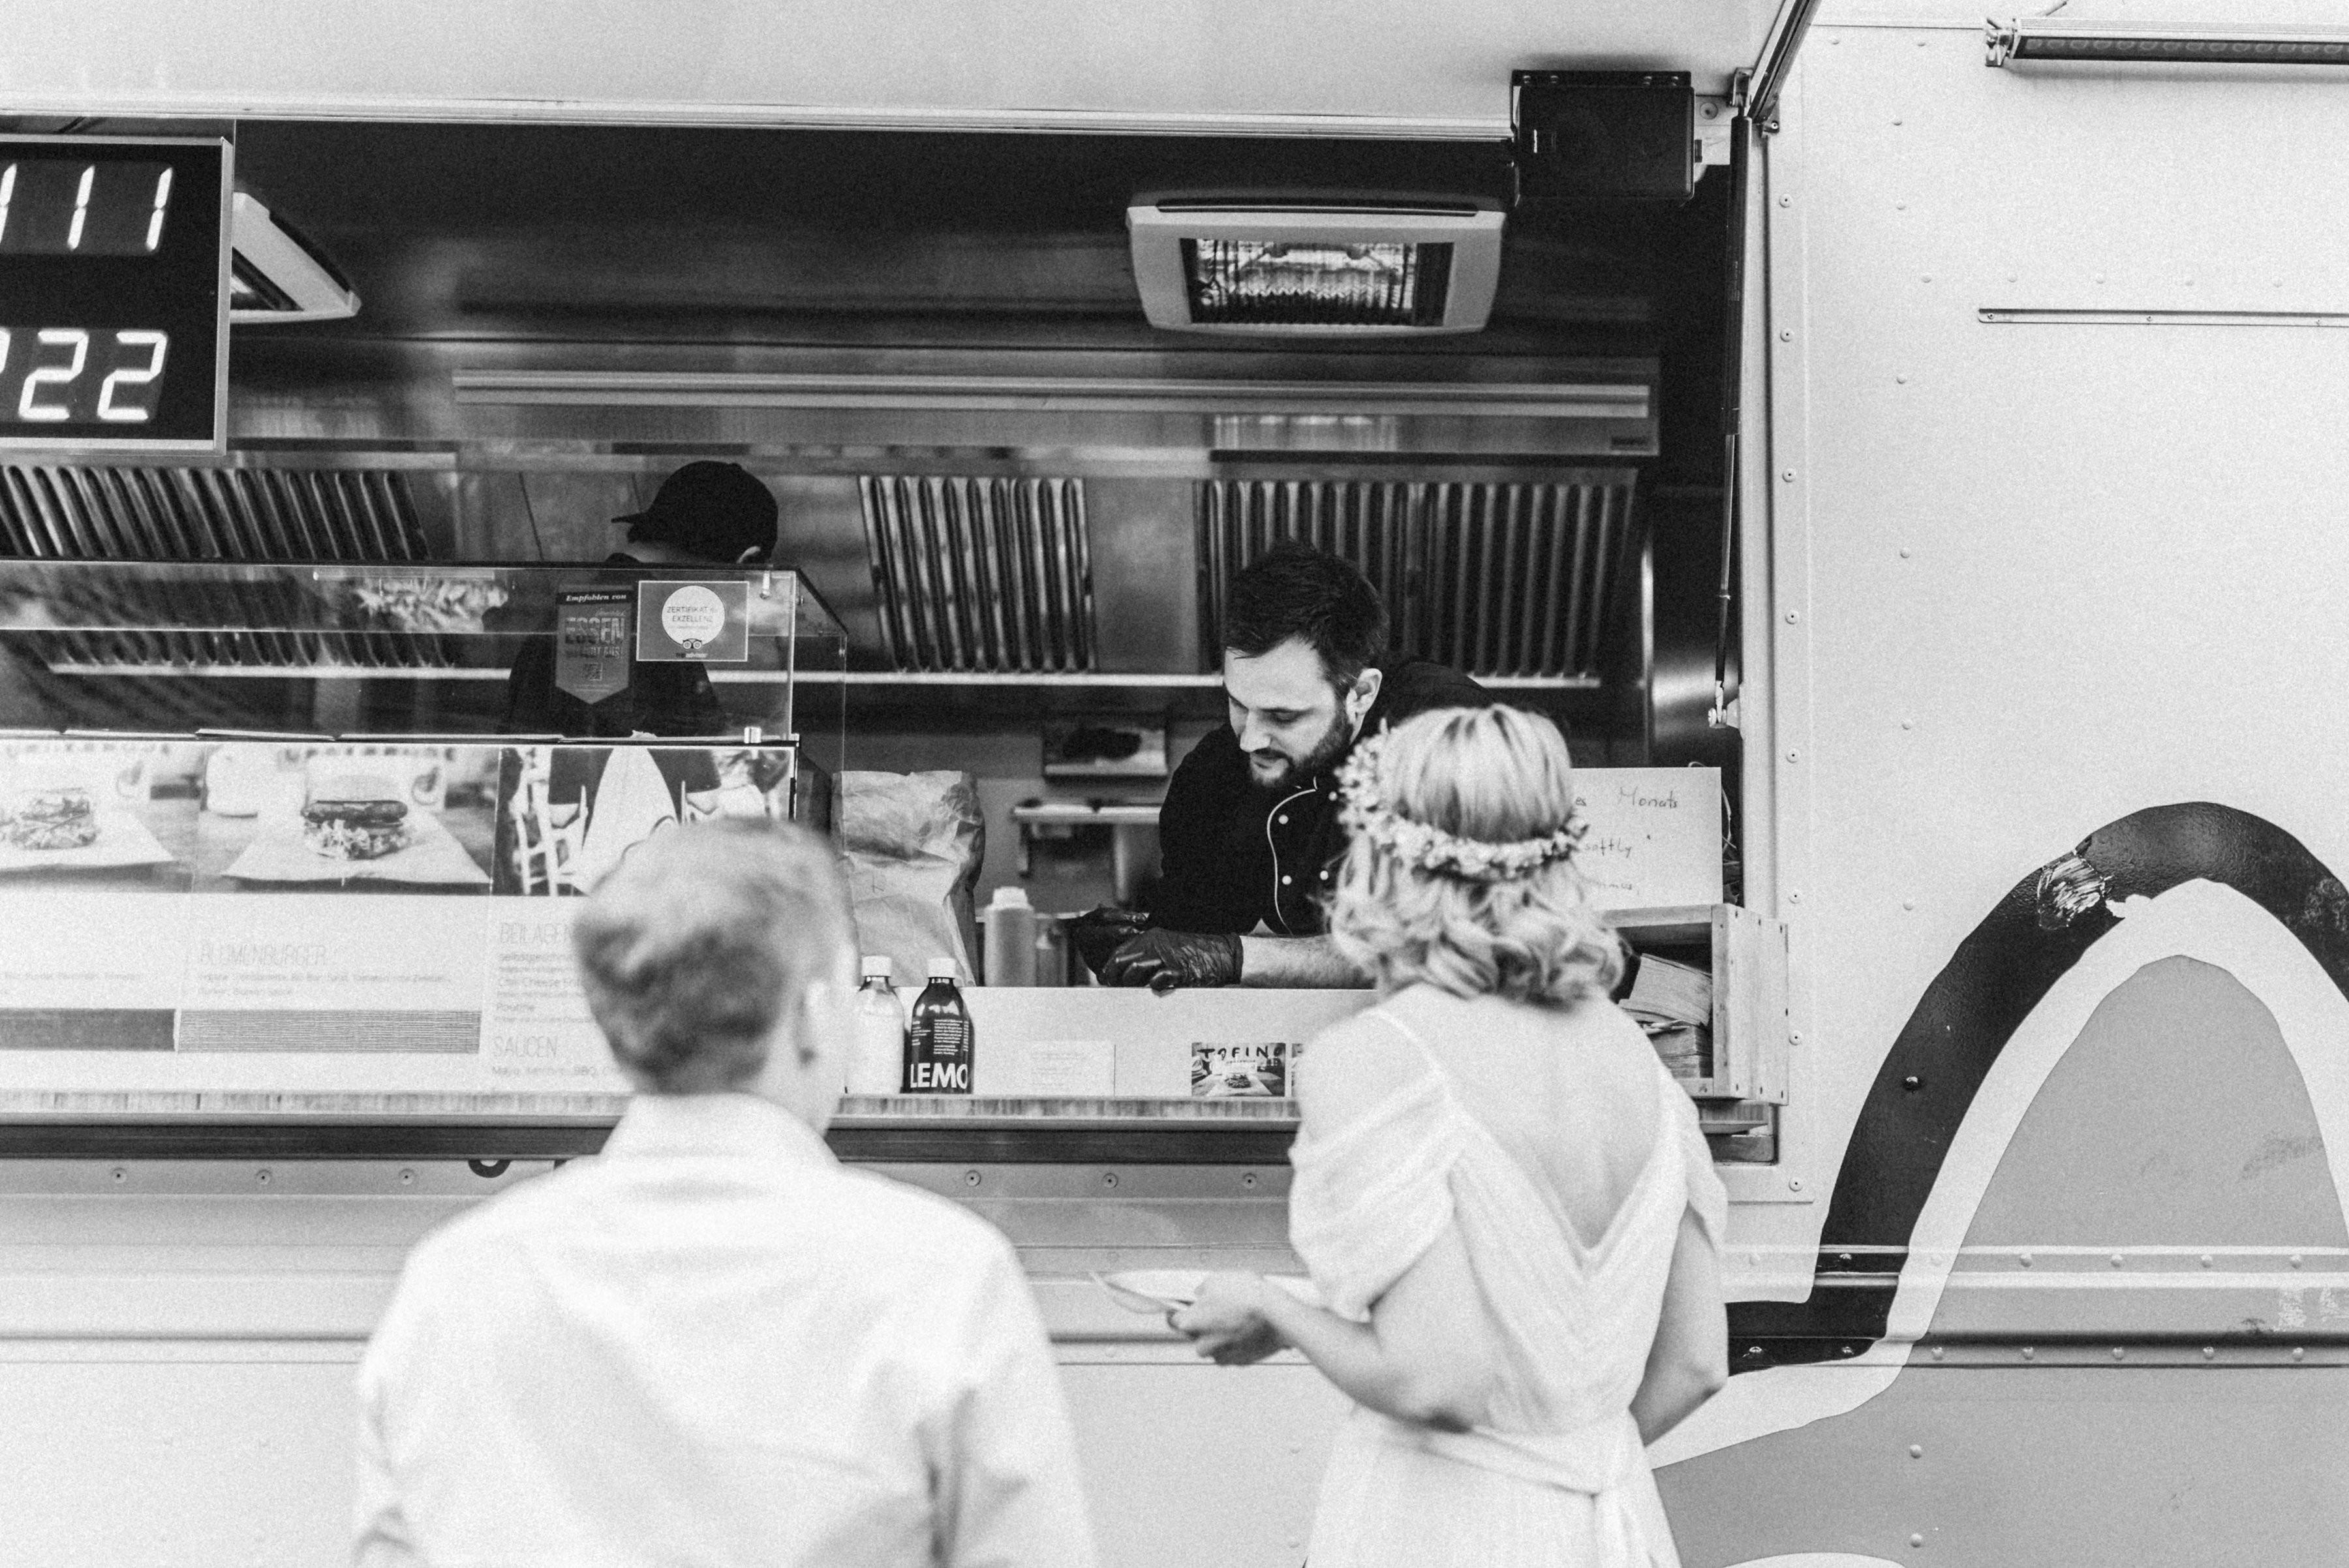 Food Truck Catering für 45 Personen